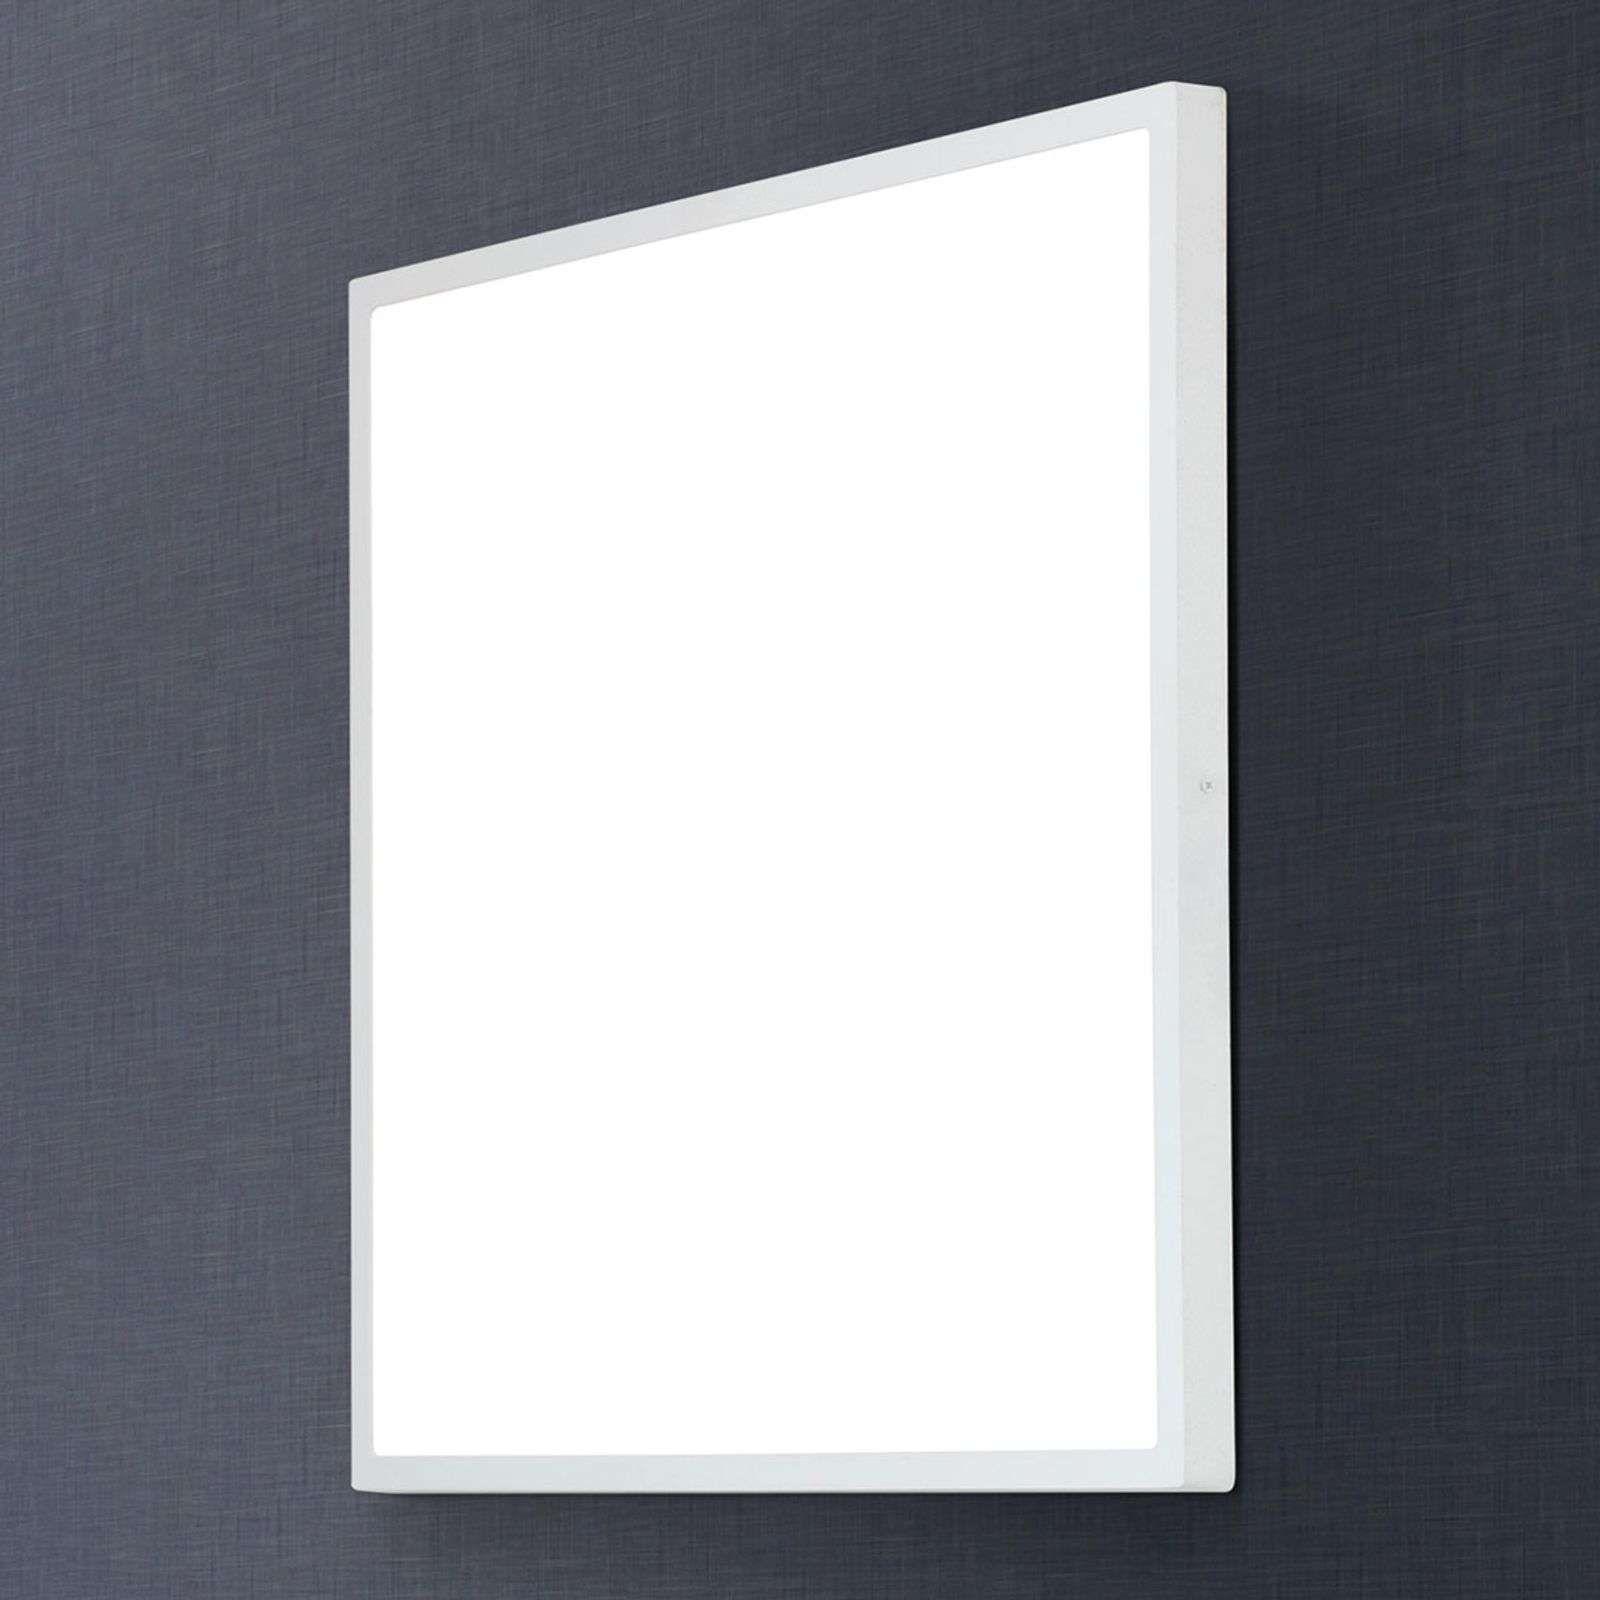 Hoekige Led Plafondlamp Lero 60 X 60 Cm Plafondlamp Plafondverlichting Binnenverlichting